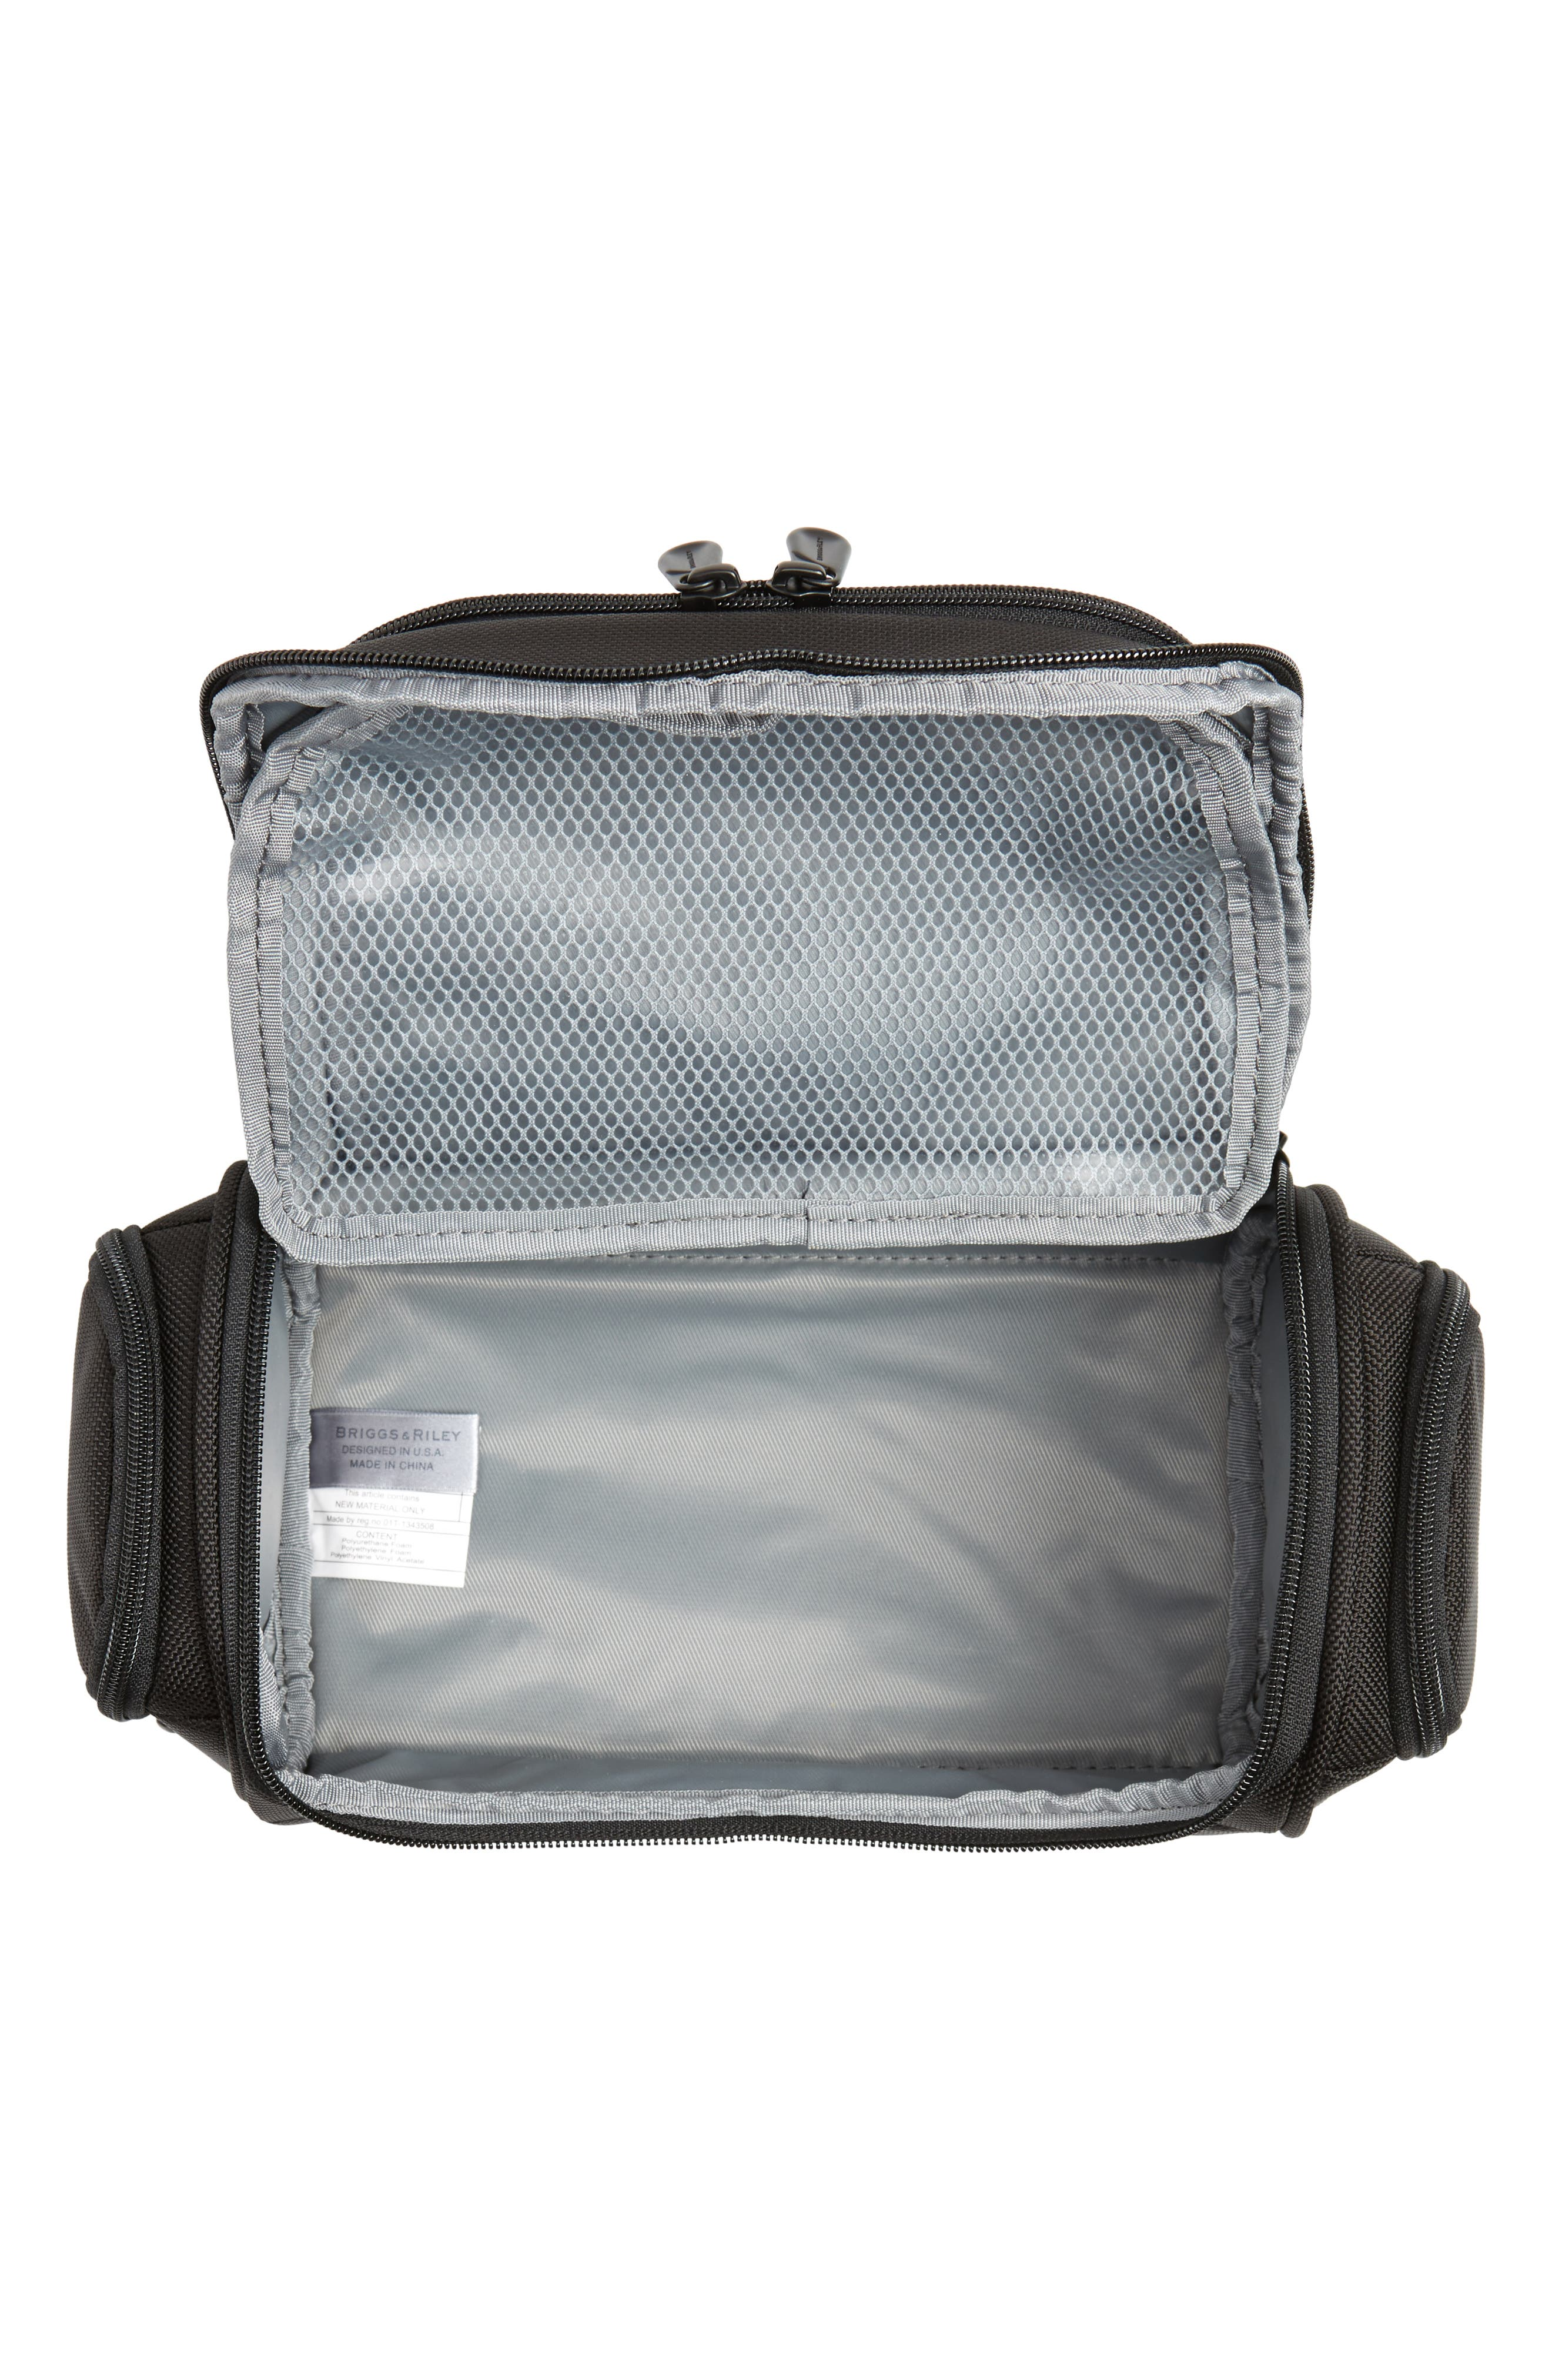 5e02b9415a1b Men's Travel Kits, Dopp Kits & Toiletry Bags   Nordstrom